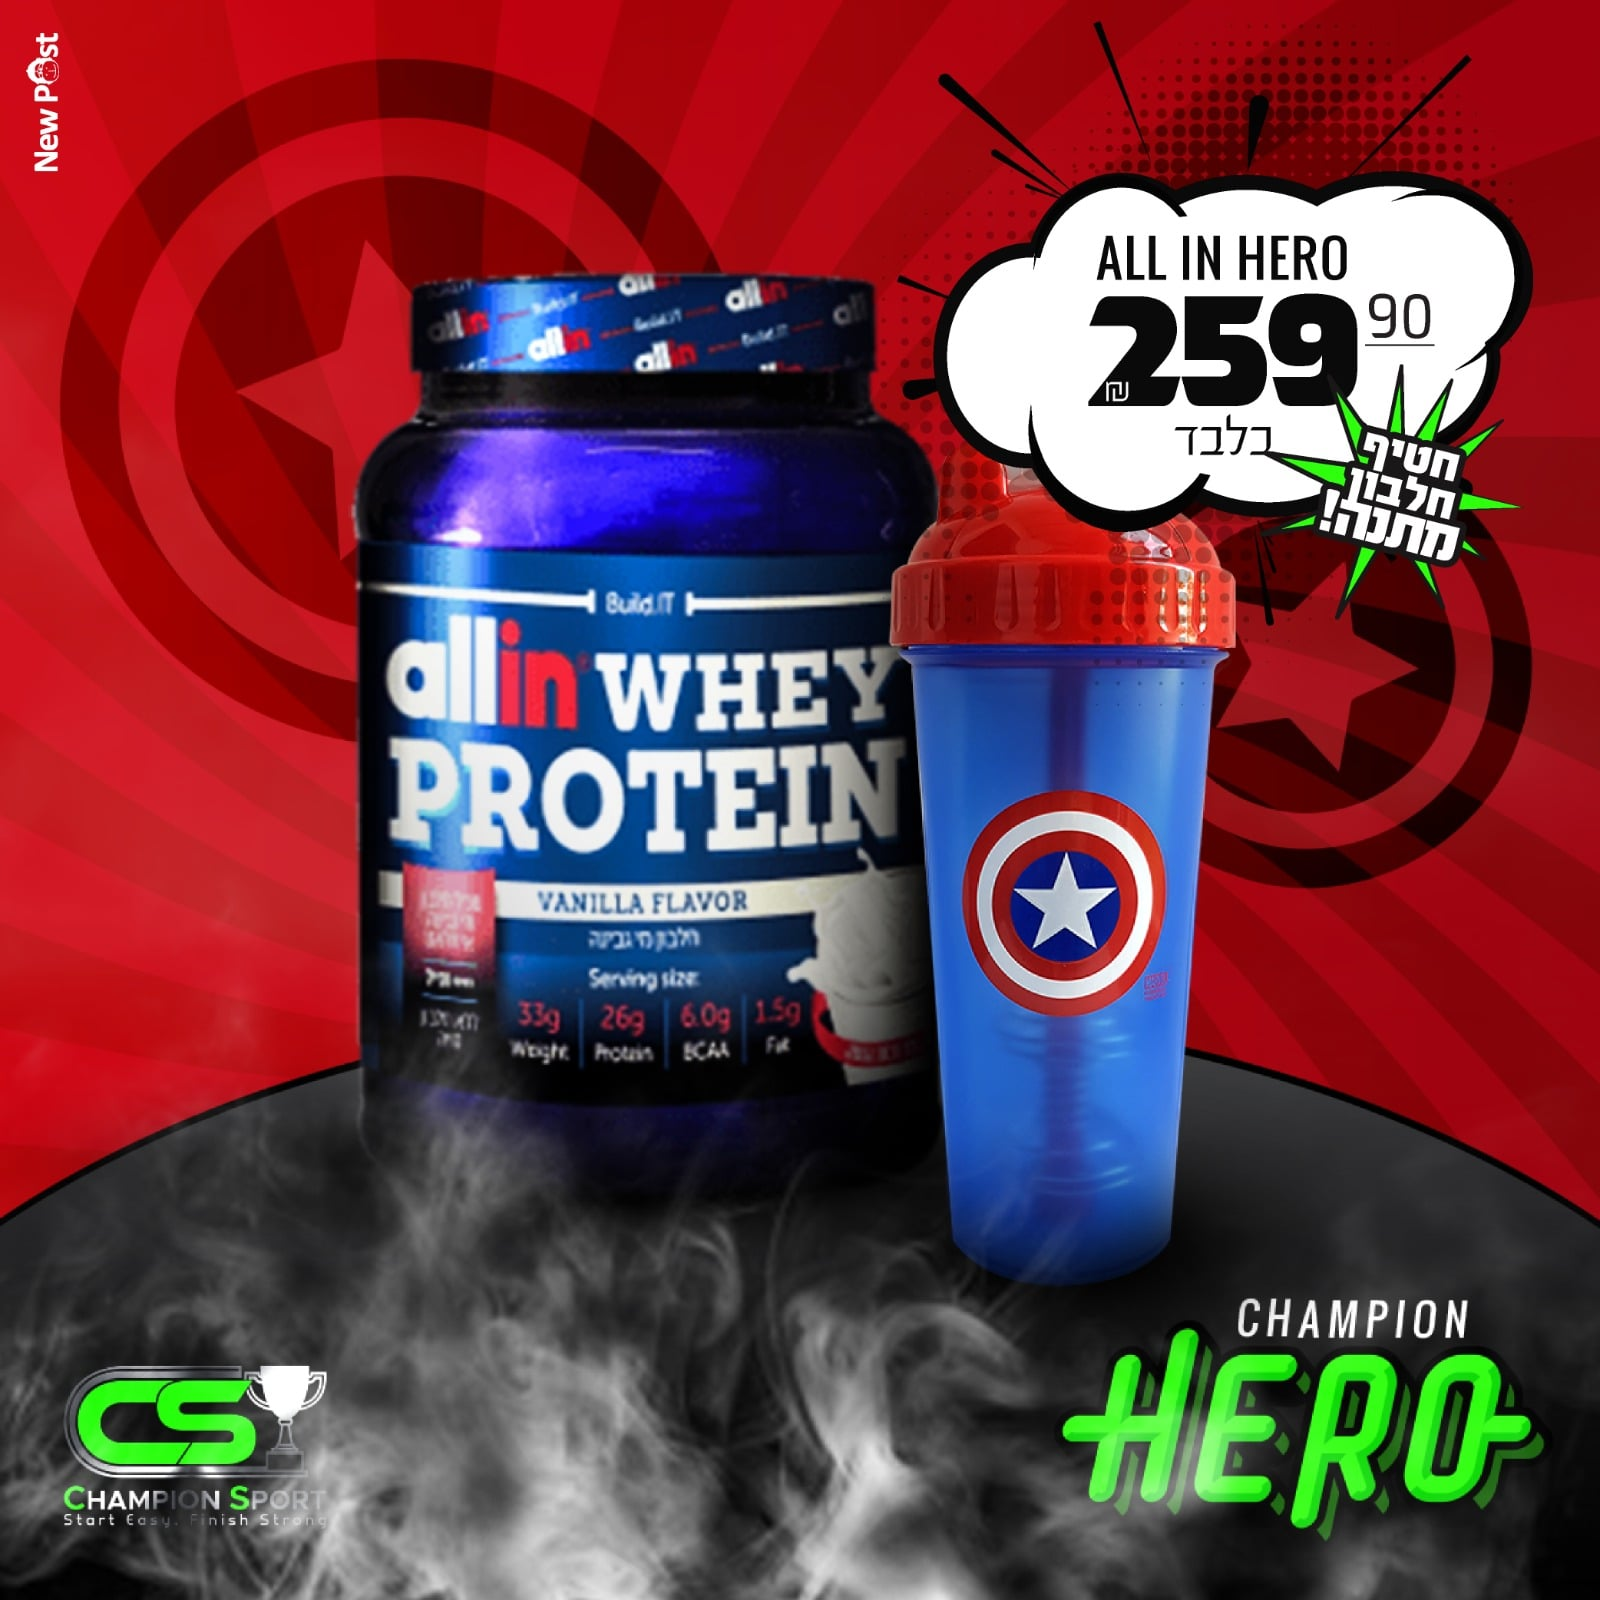 ALL IN HERO אבקת חלבון ALLIN 2.27KG+שייקר גיבור על מתנה